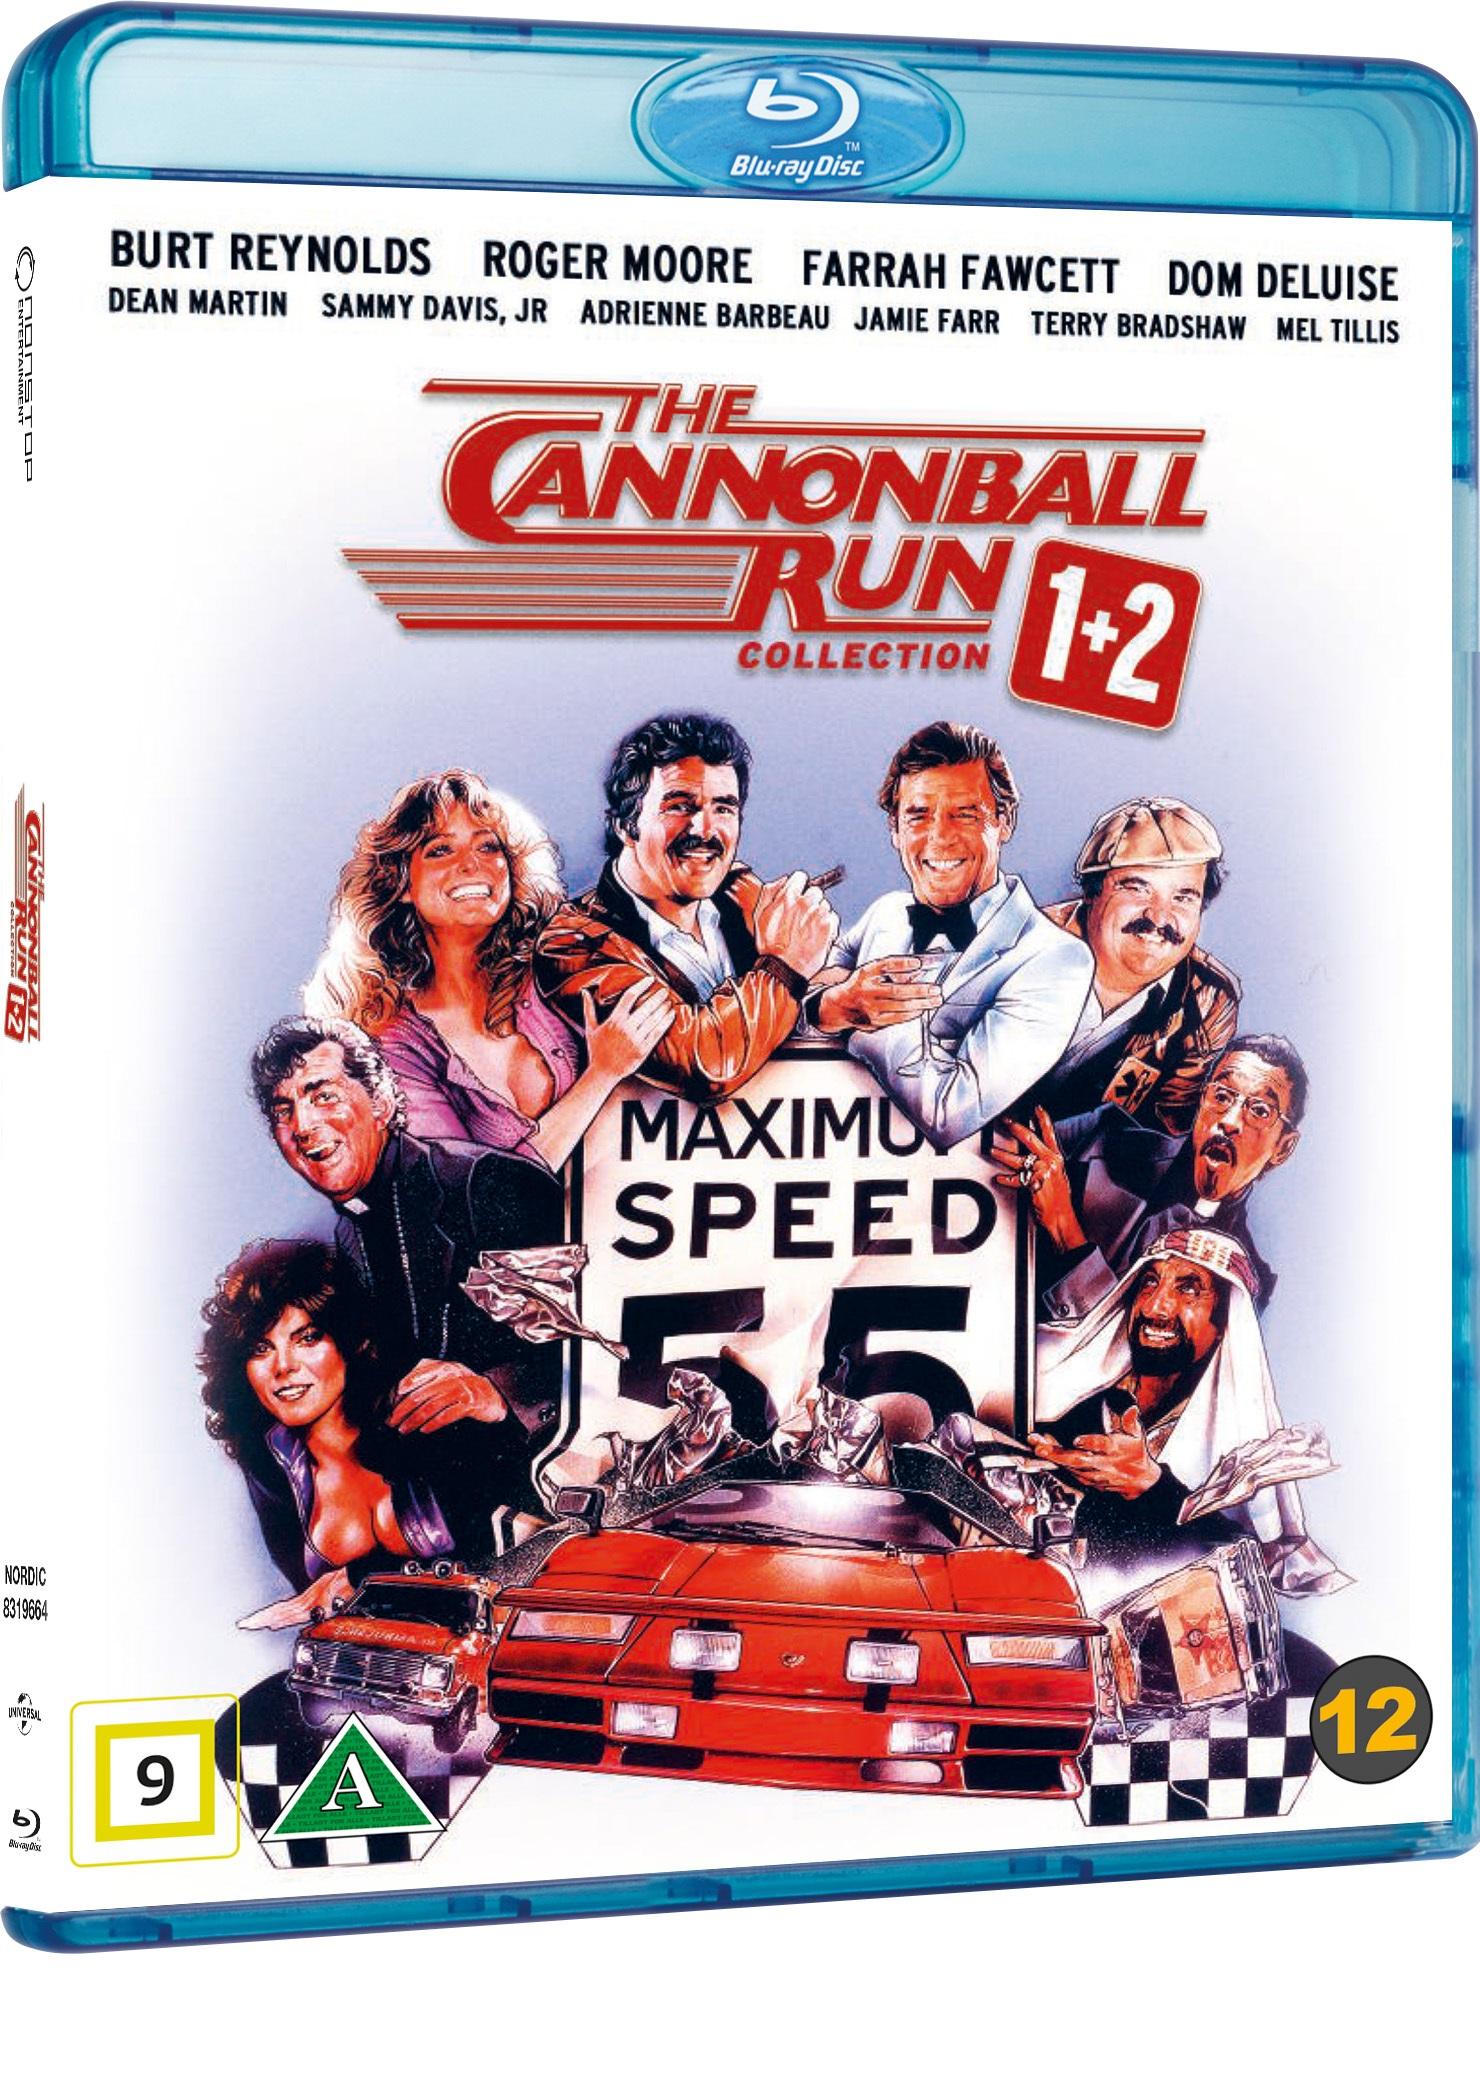 The Cannonball Run Collection (Ud at køre med de skøre) -  - Film -  - 5053083196646 - 26/9-2019